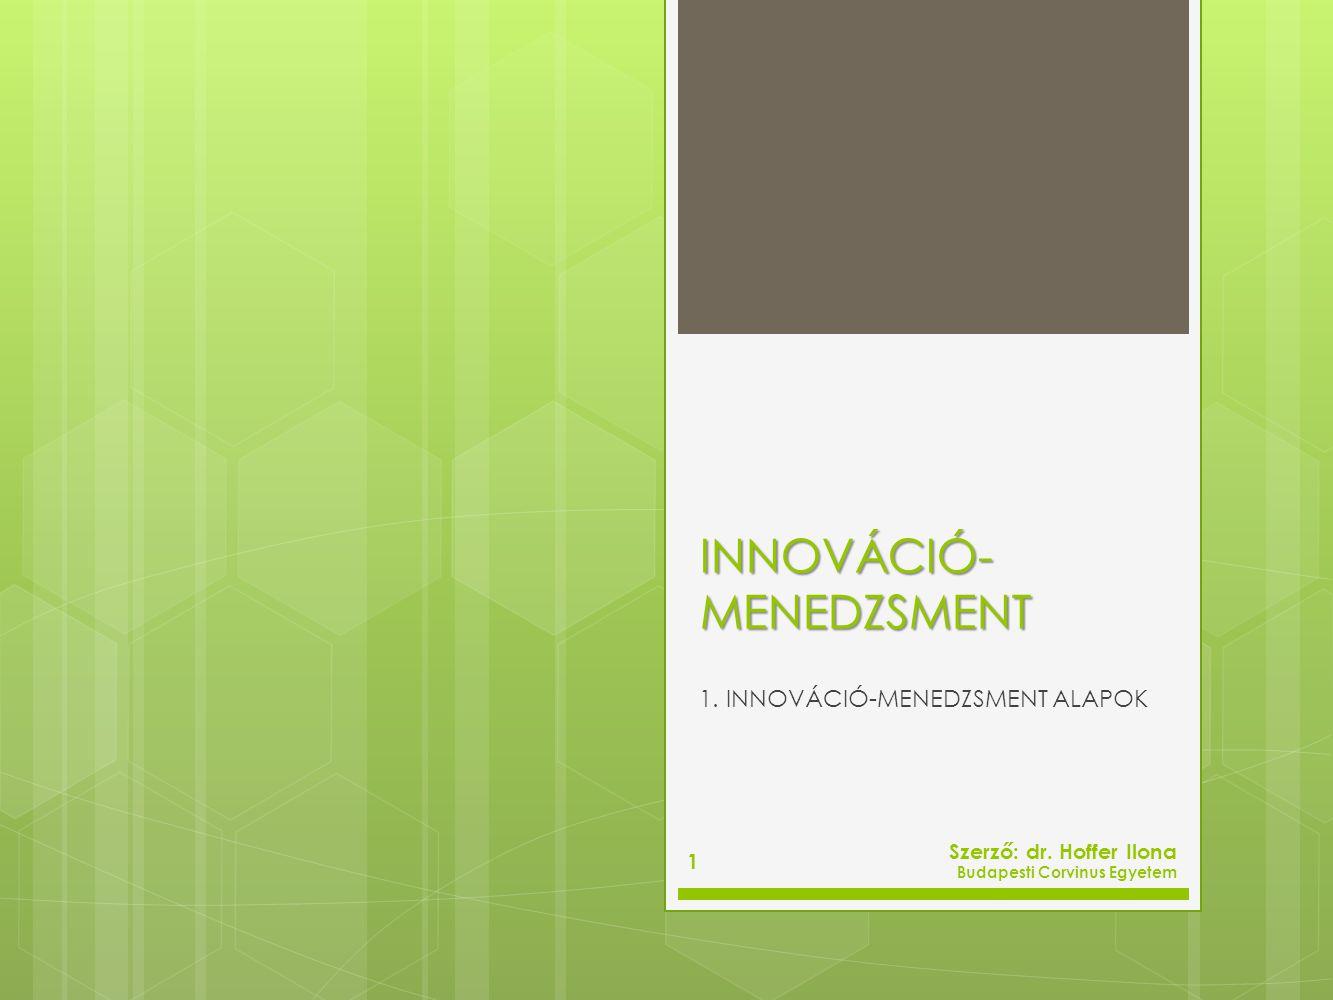 INNOVÁCIÓ- MENEDZSMENT 1. INNOVÁCIÓ-MENEDZSMENT ALAPOK Szerző: dr. Hoffer Ilona Budapesti Corvinus Egyetem 1